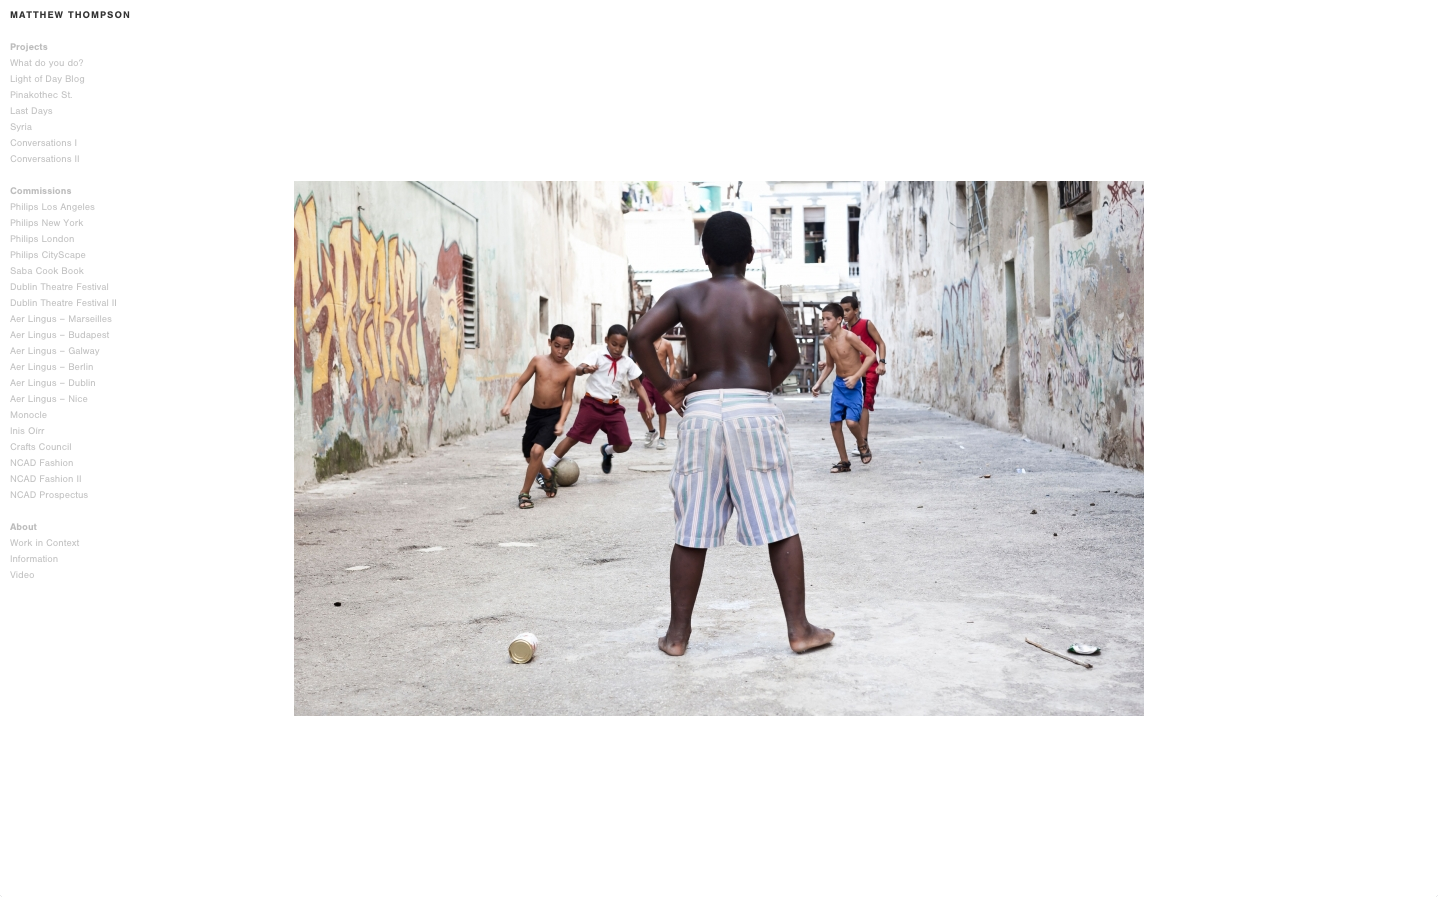 Cover image: Matthew Thompson Photography (2012)